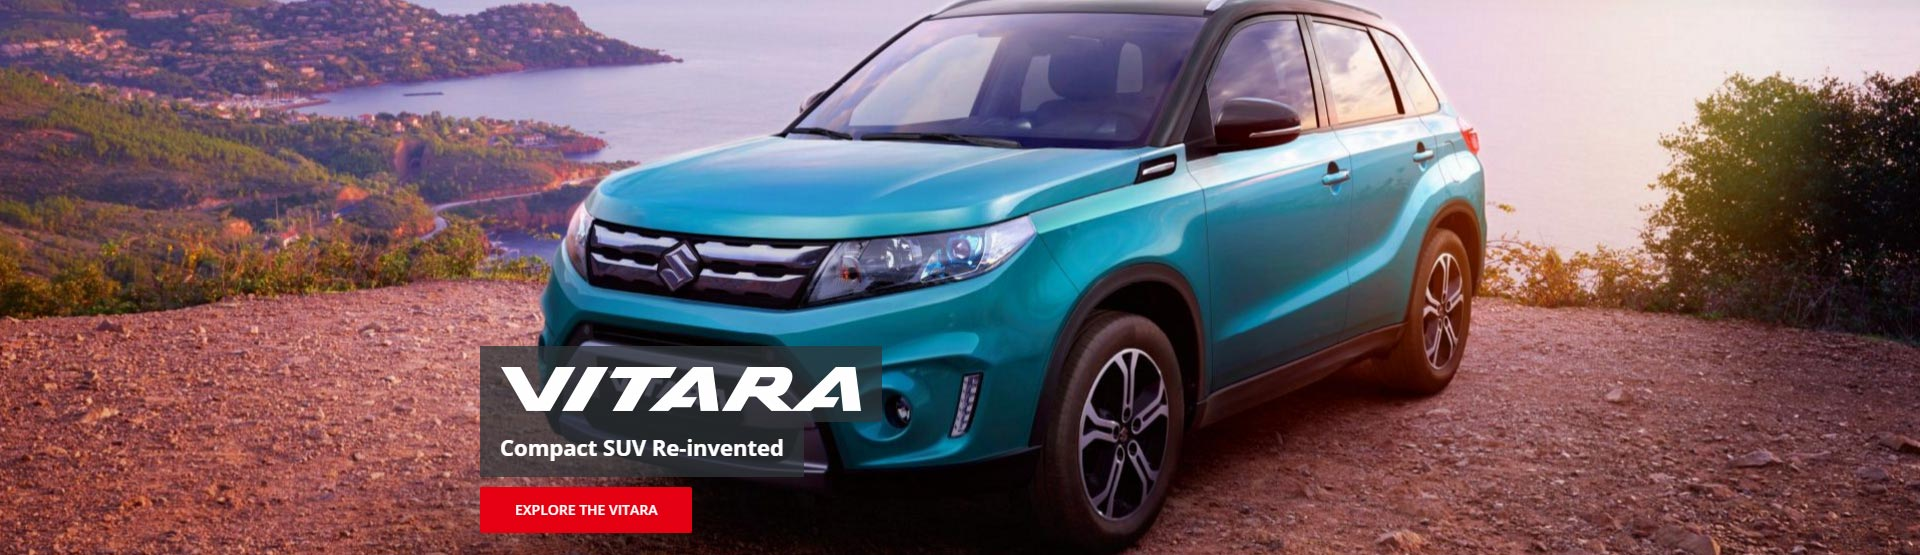 The Suzuki Vitara, the compact SUV reinvented, explore it at Redcliffe Suzuki Brisbane.